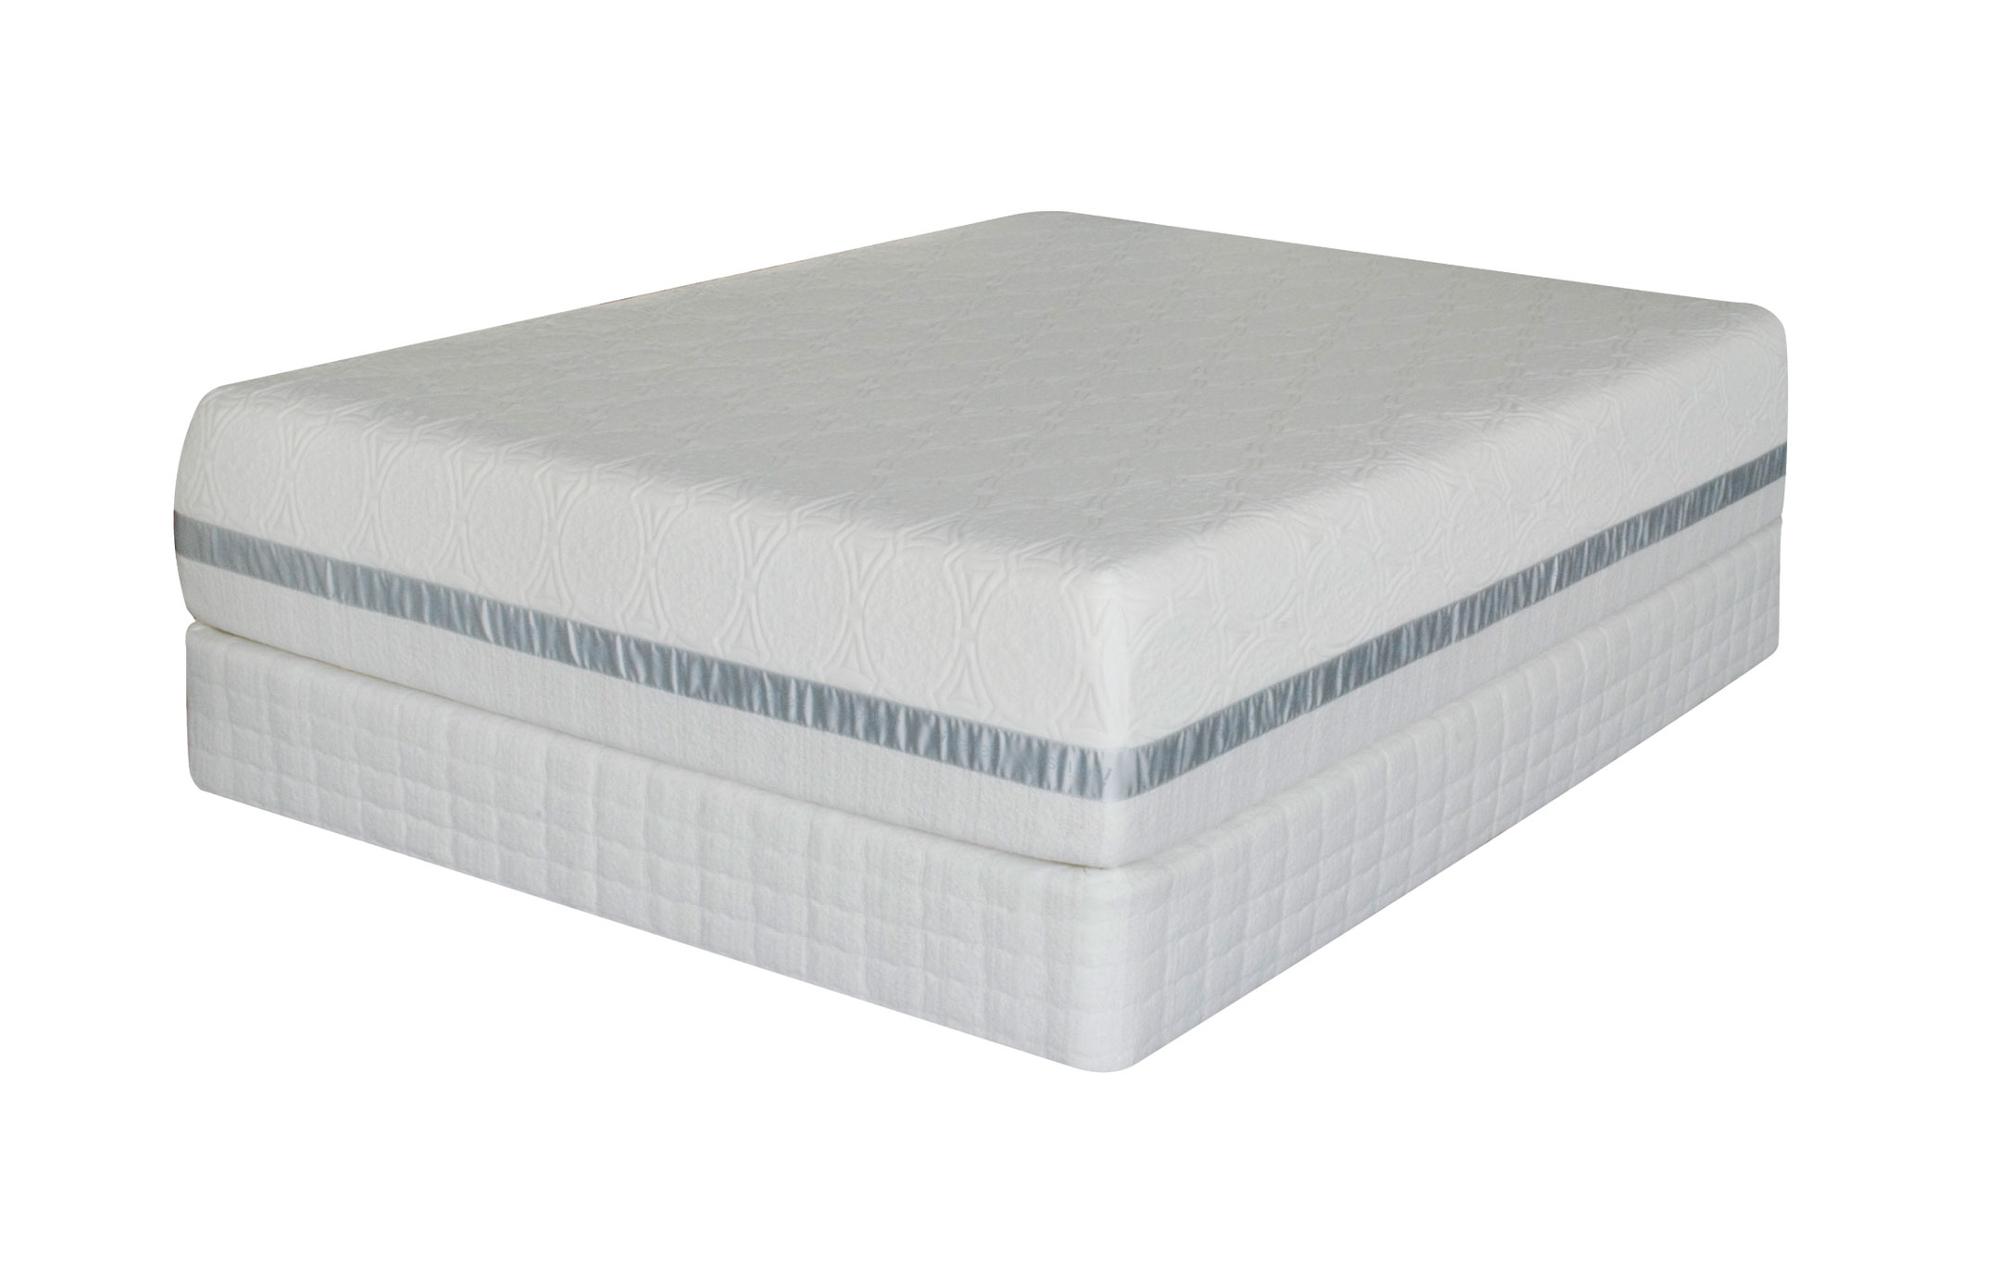 Serta Roma Premium Memory Foam 10 Mattress Full